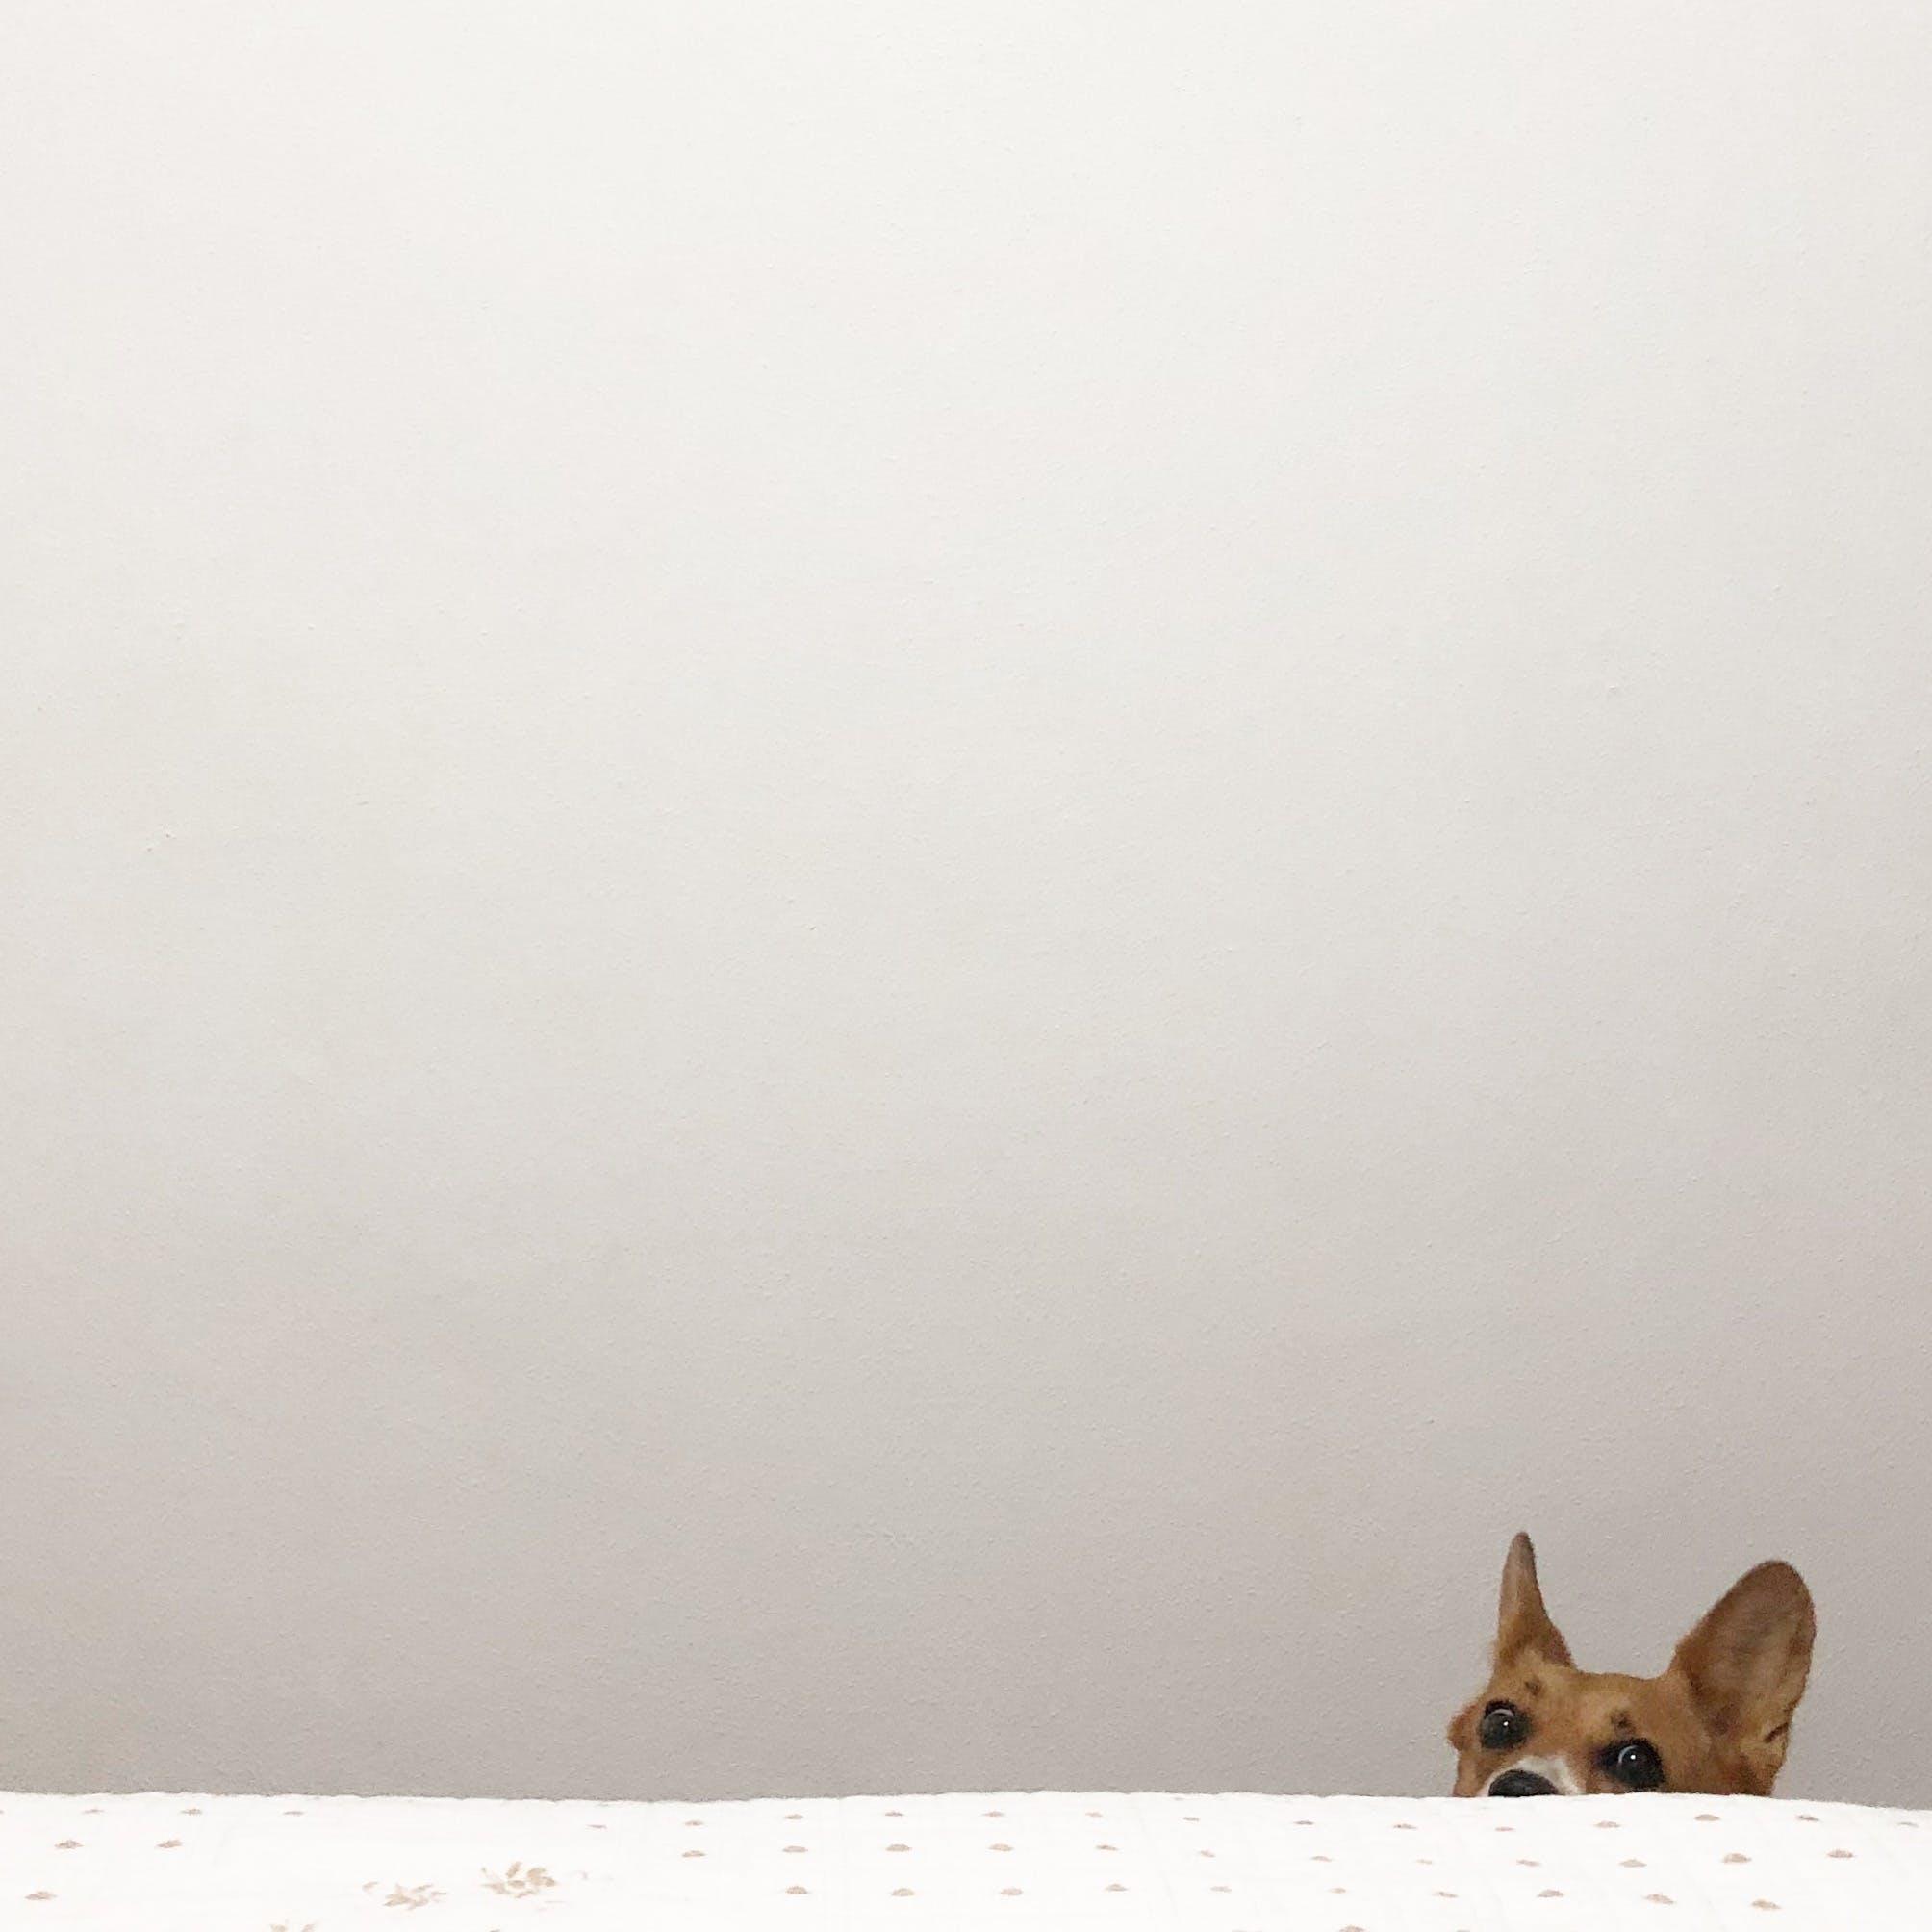 Free stock photo of wall, dog, peeking, home interior